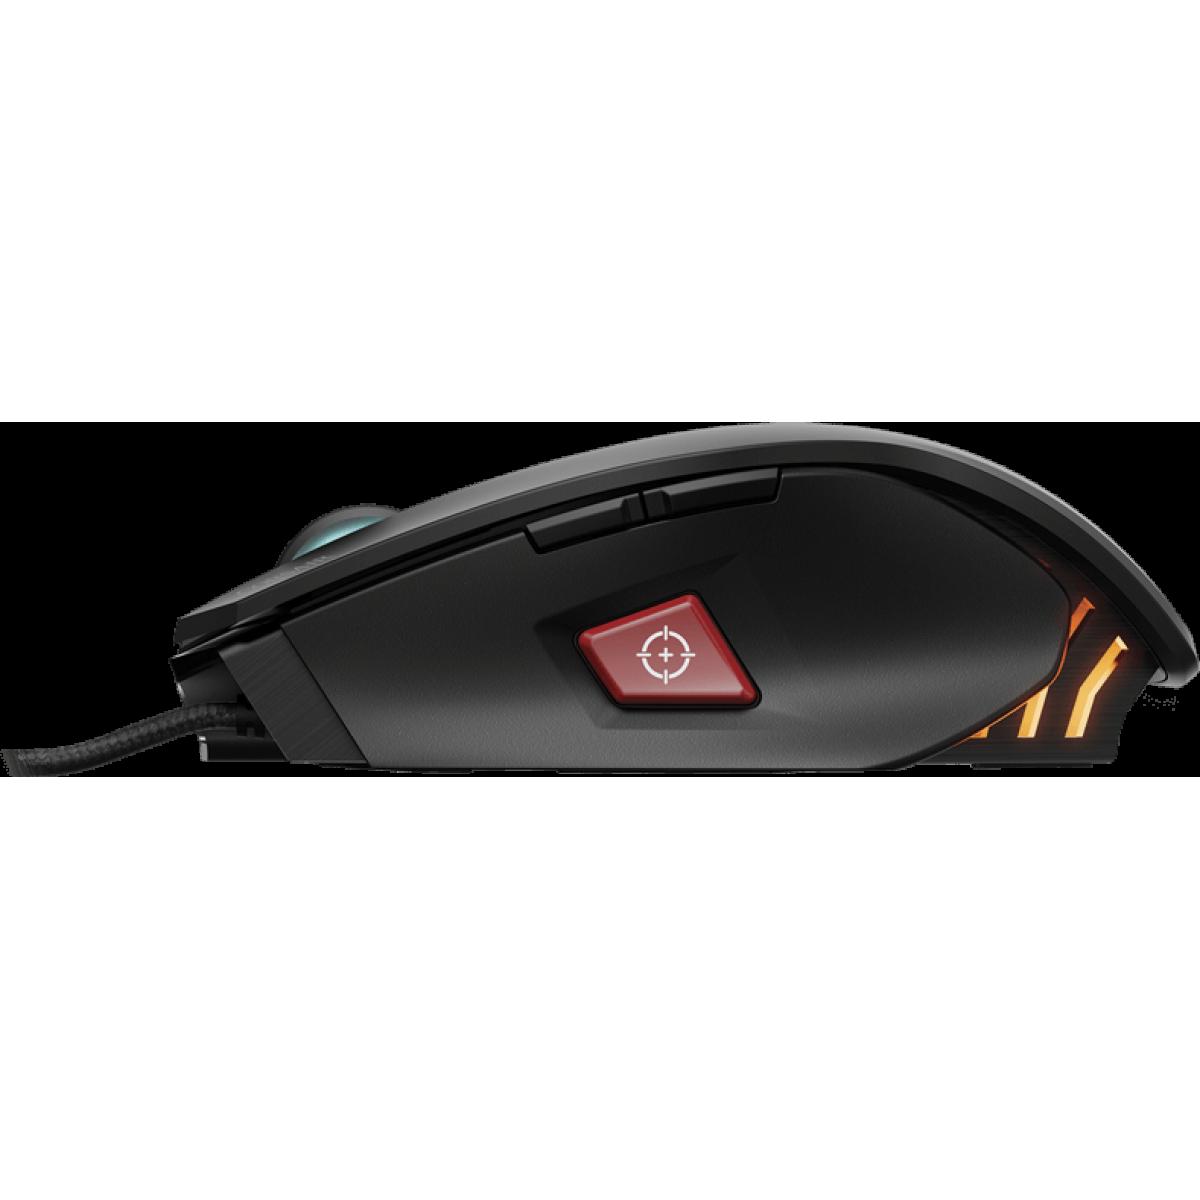 Mouse Corsair Gamer Vengeance M65 PRO RGB CH-9300011-NA 8 Botões 12000 DPI Black